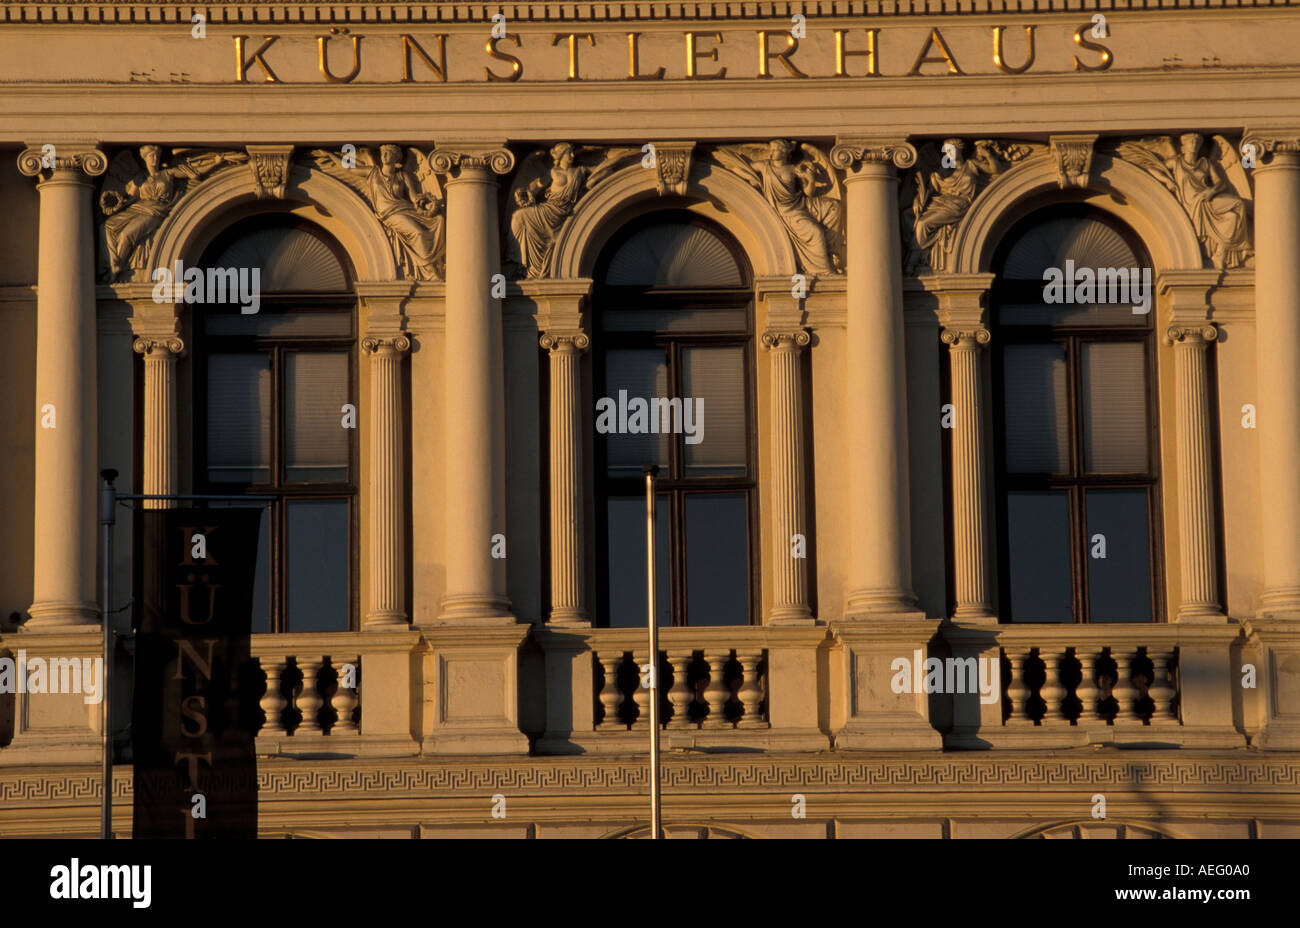 building art house Kuenstlerhaus Vienna - Stock Image